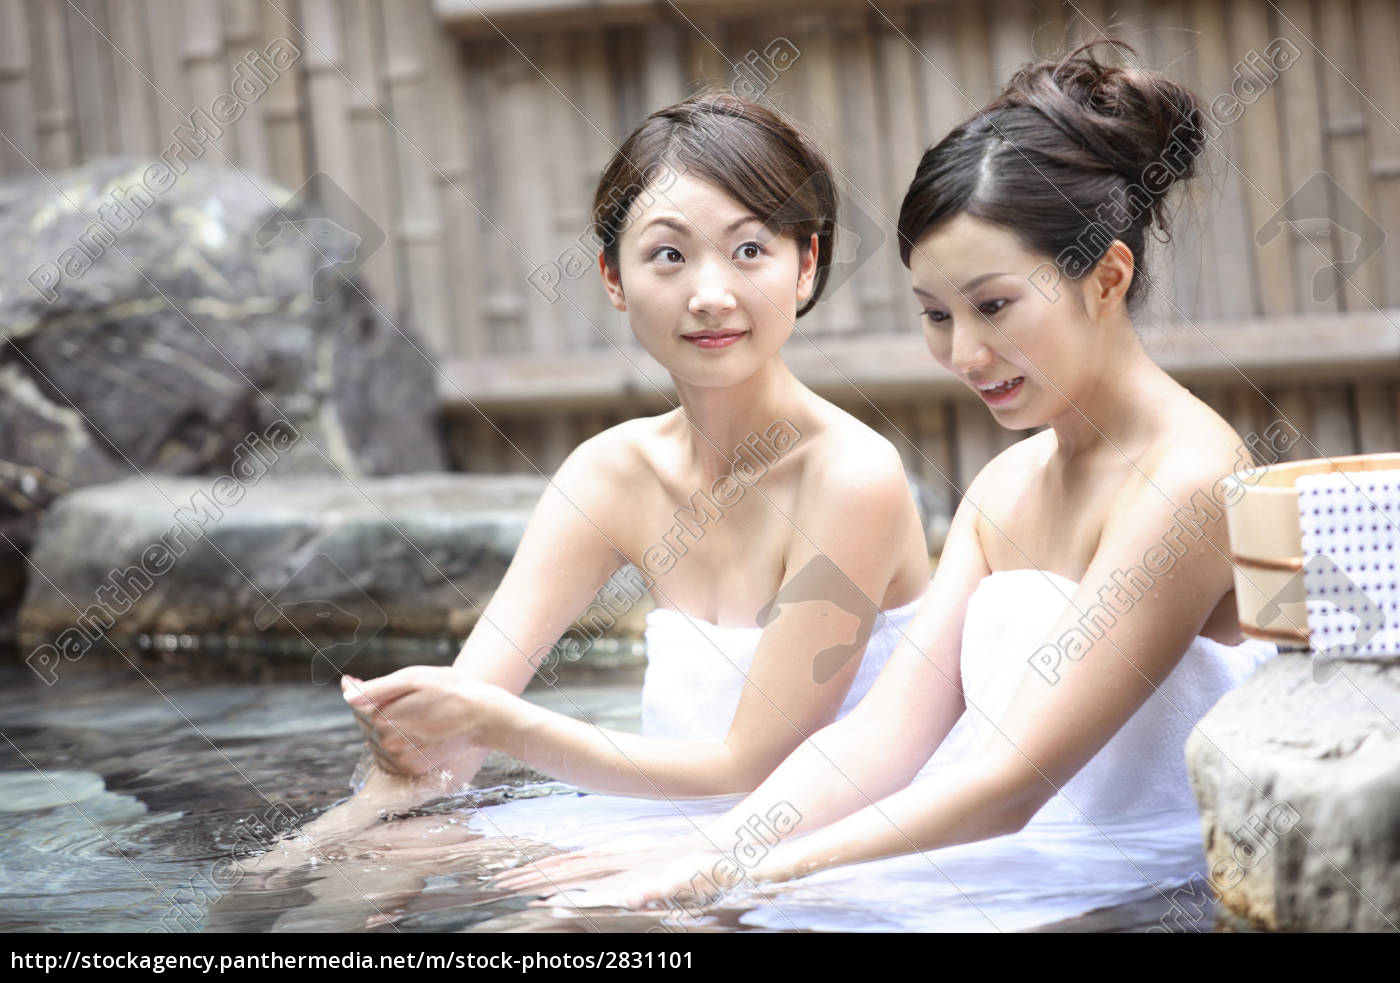 Japanische frauen daten